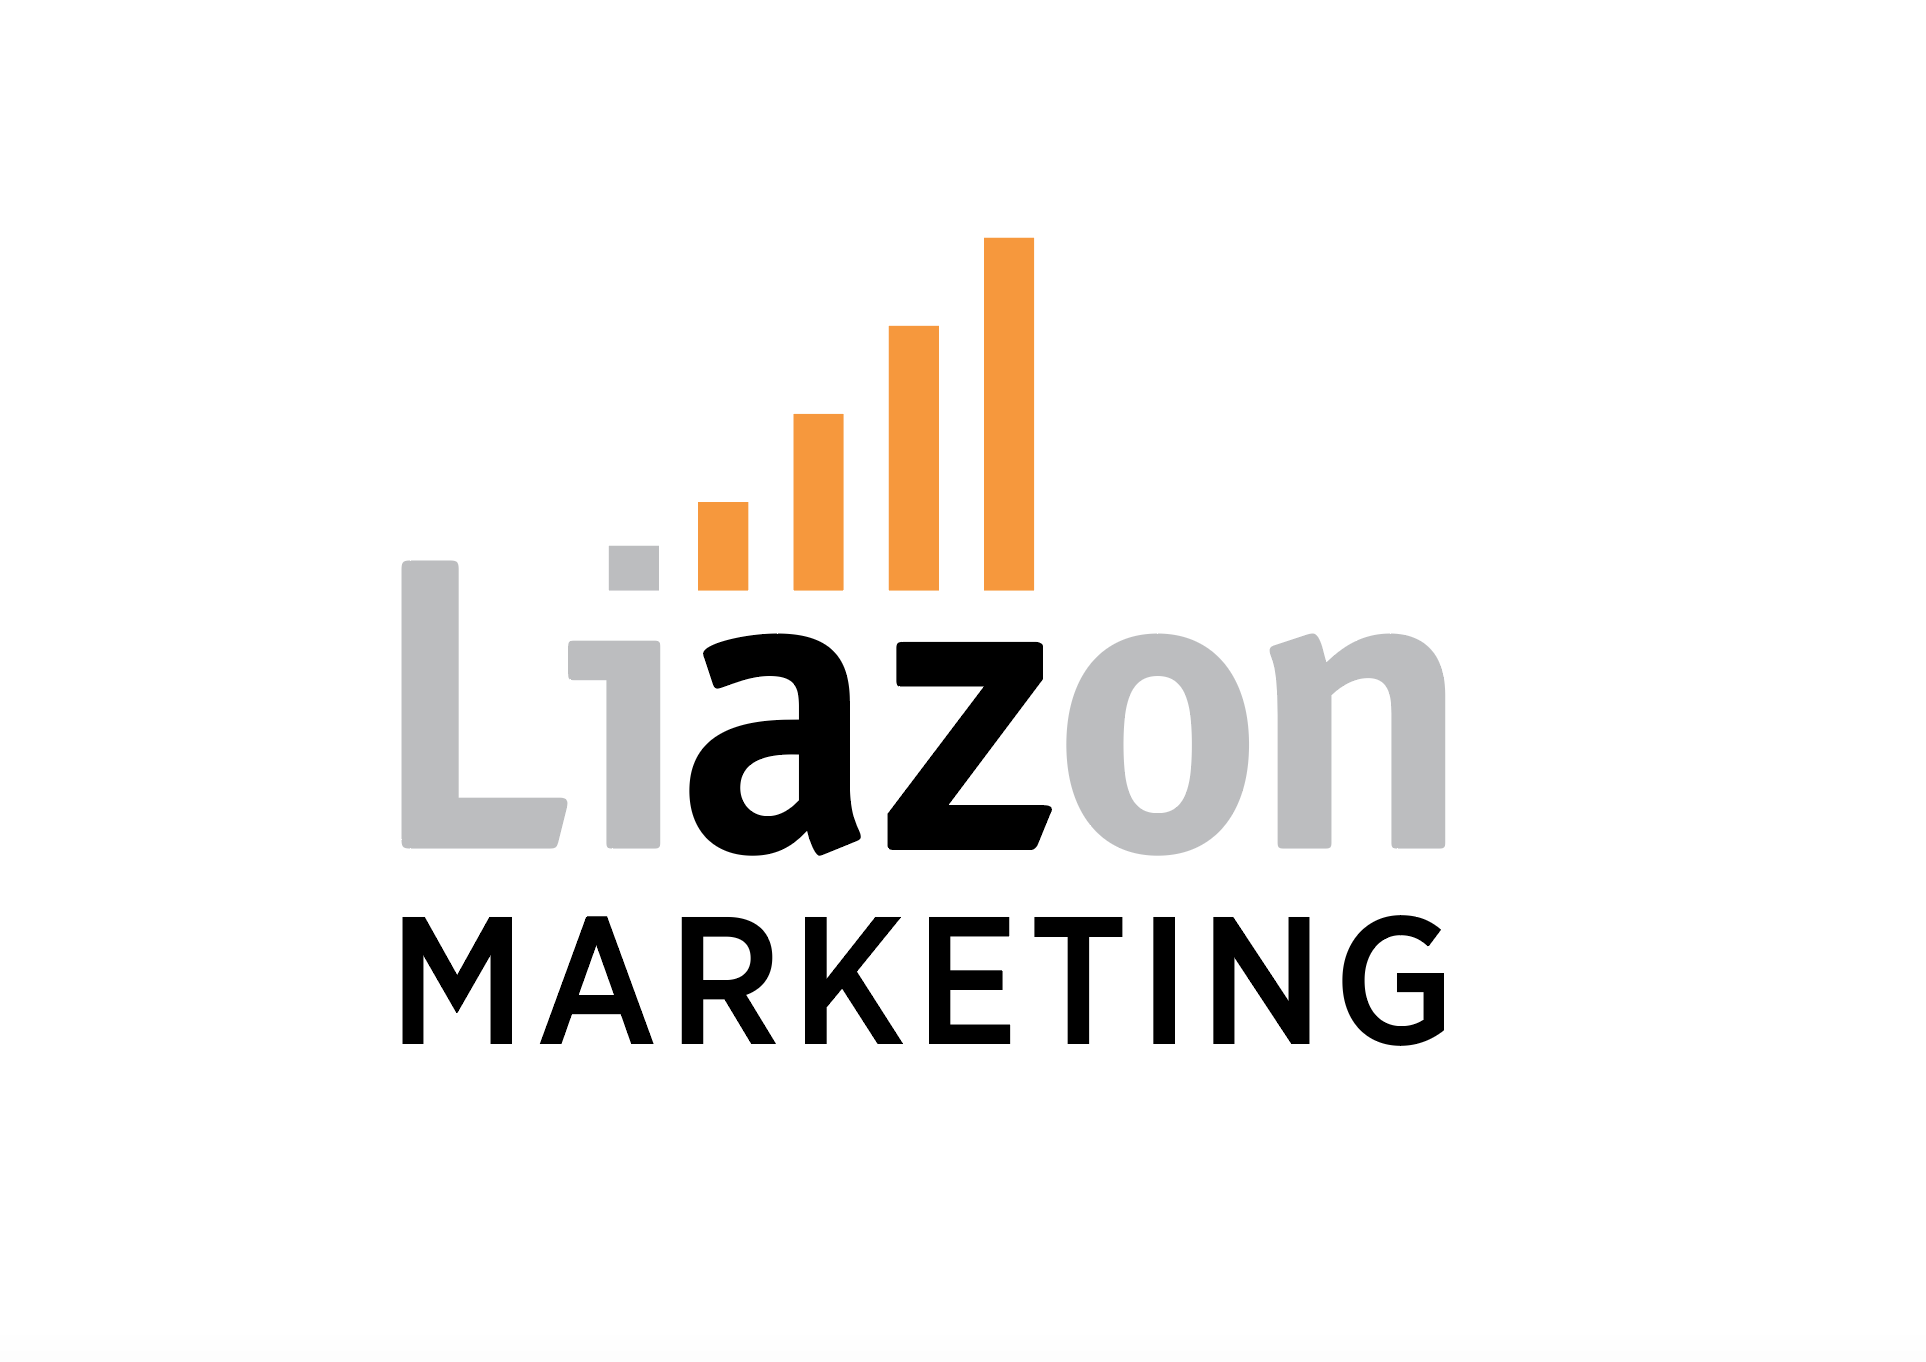 liazon marketing